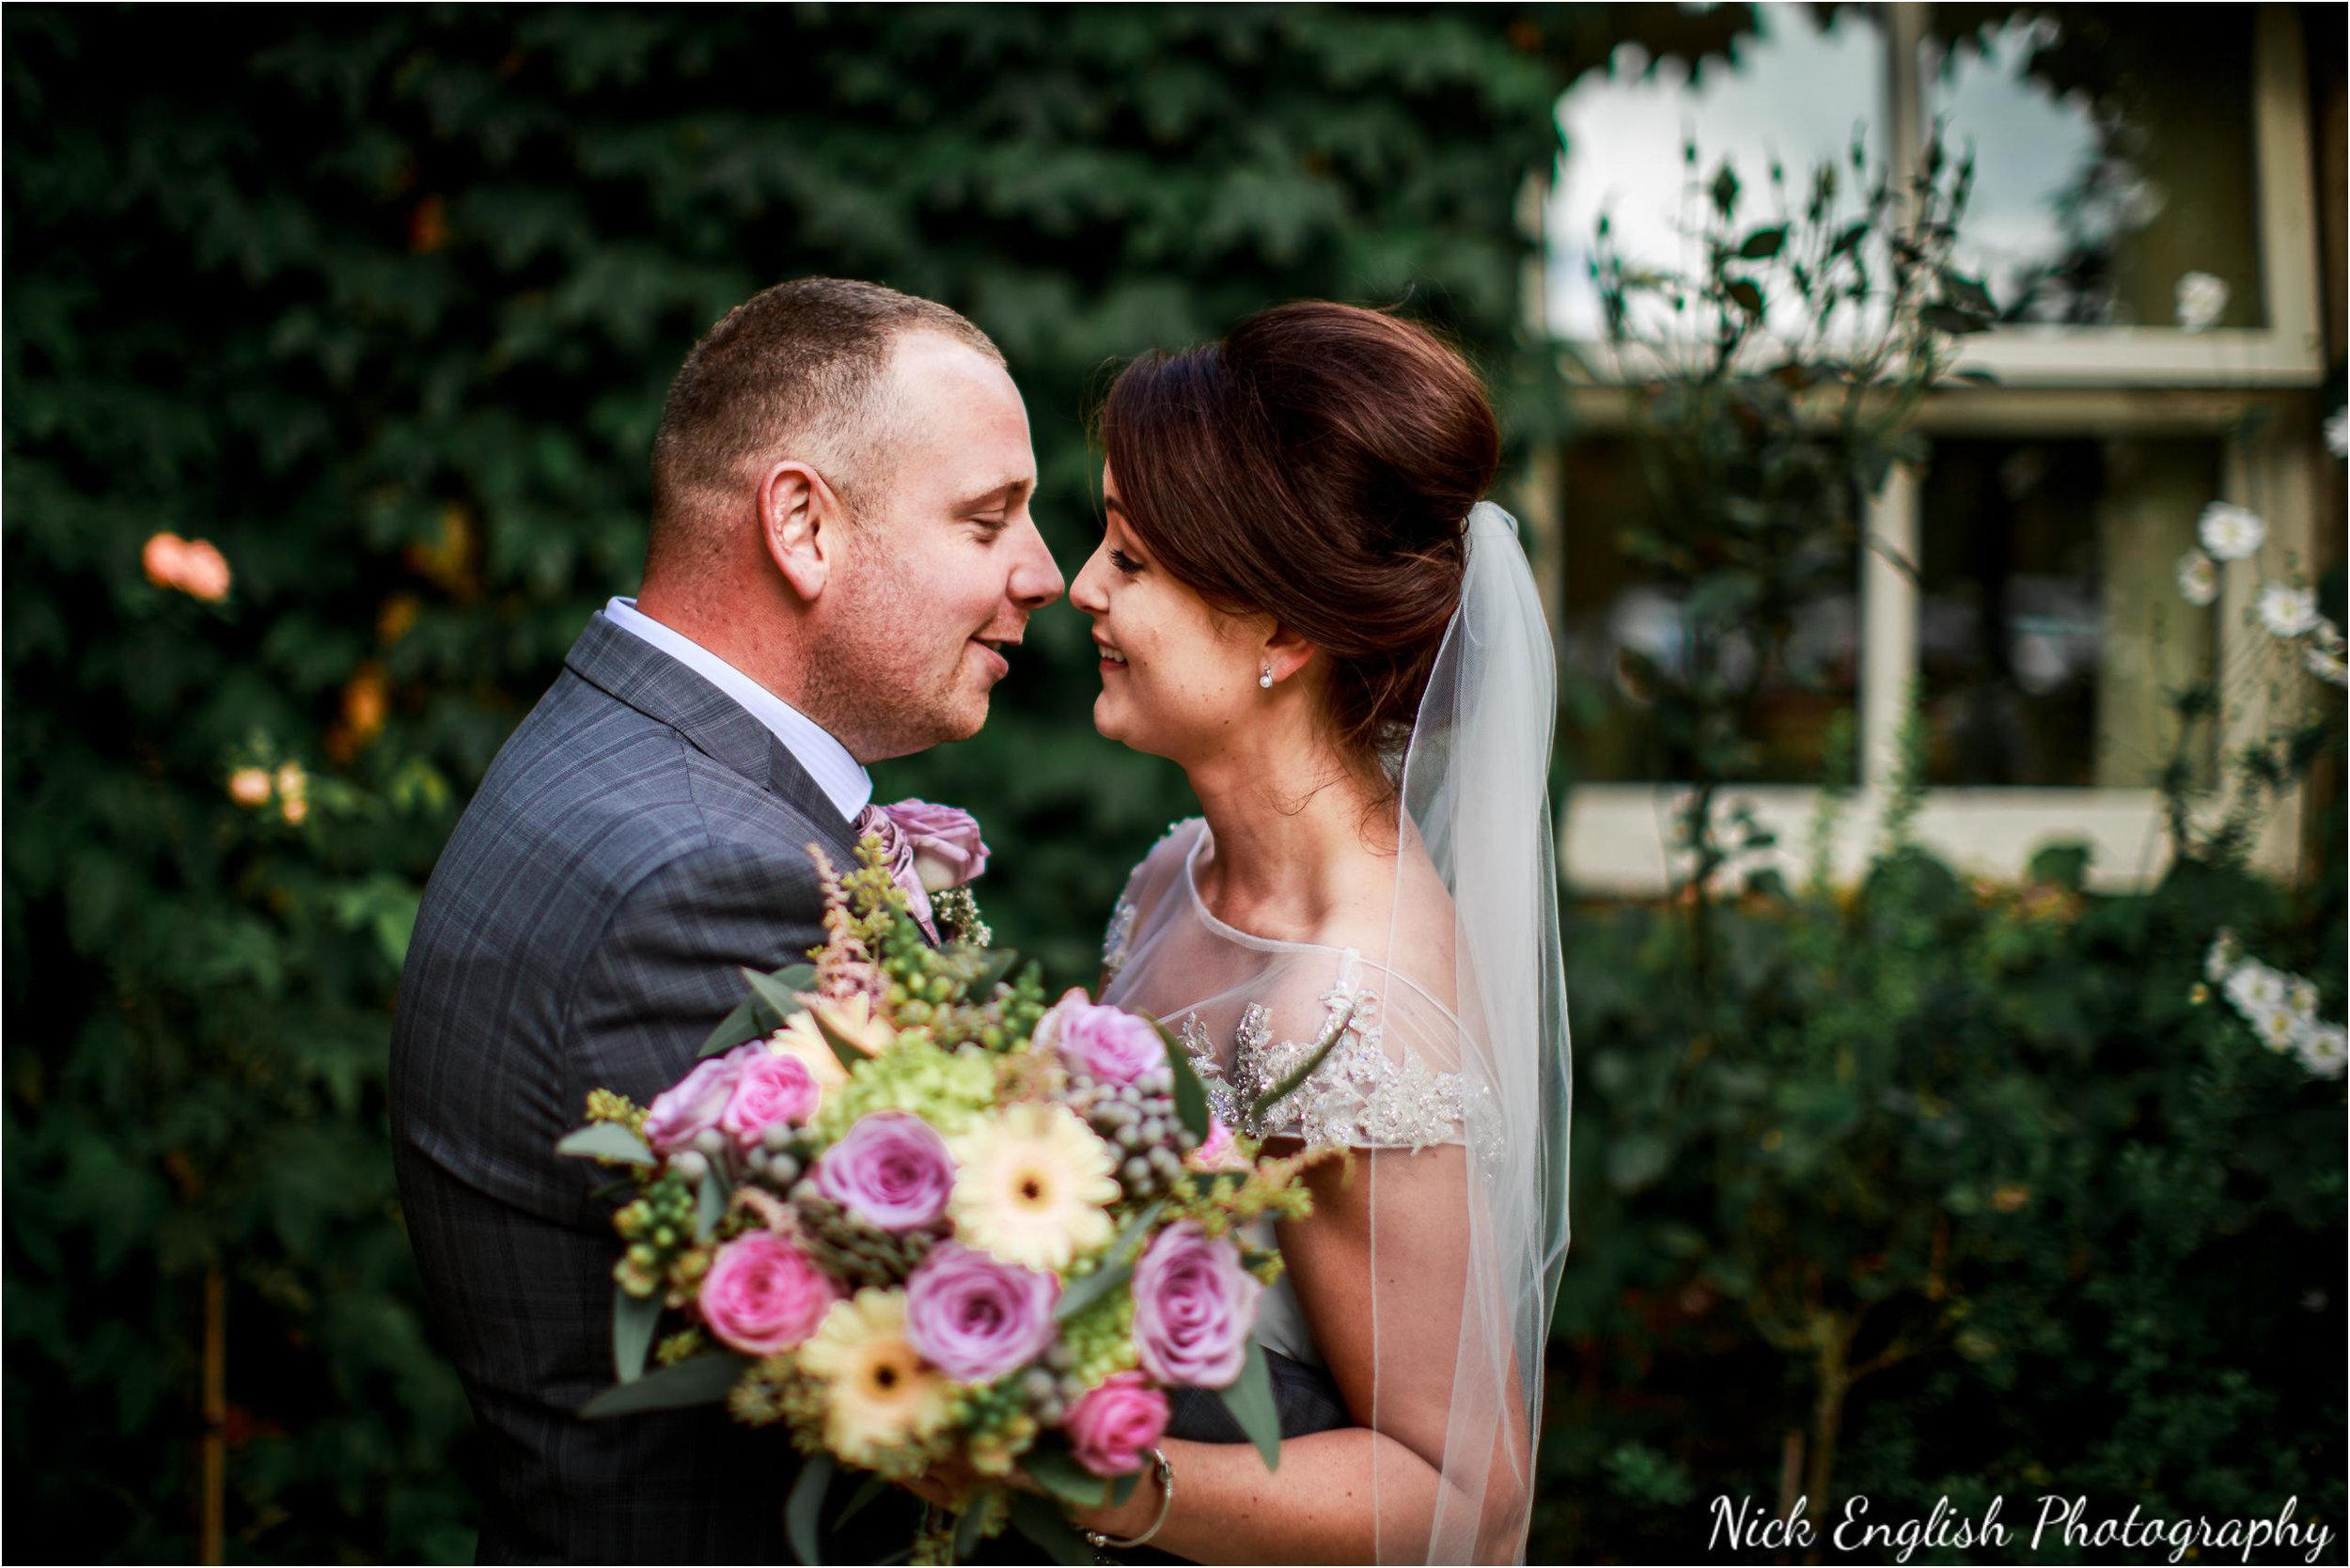 Stacey-Ash-Wedding-Photographs-Stanley-House-Preston-Lancashire-131.jpg